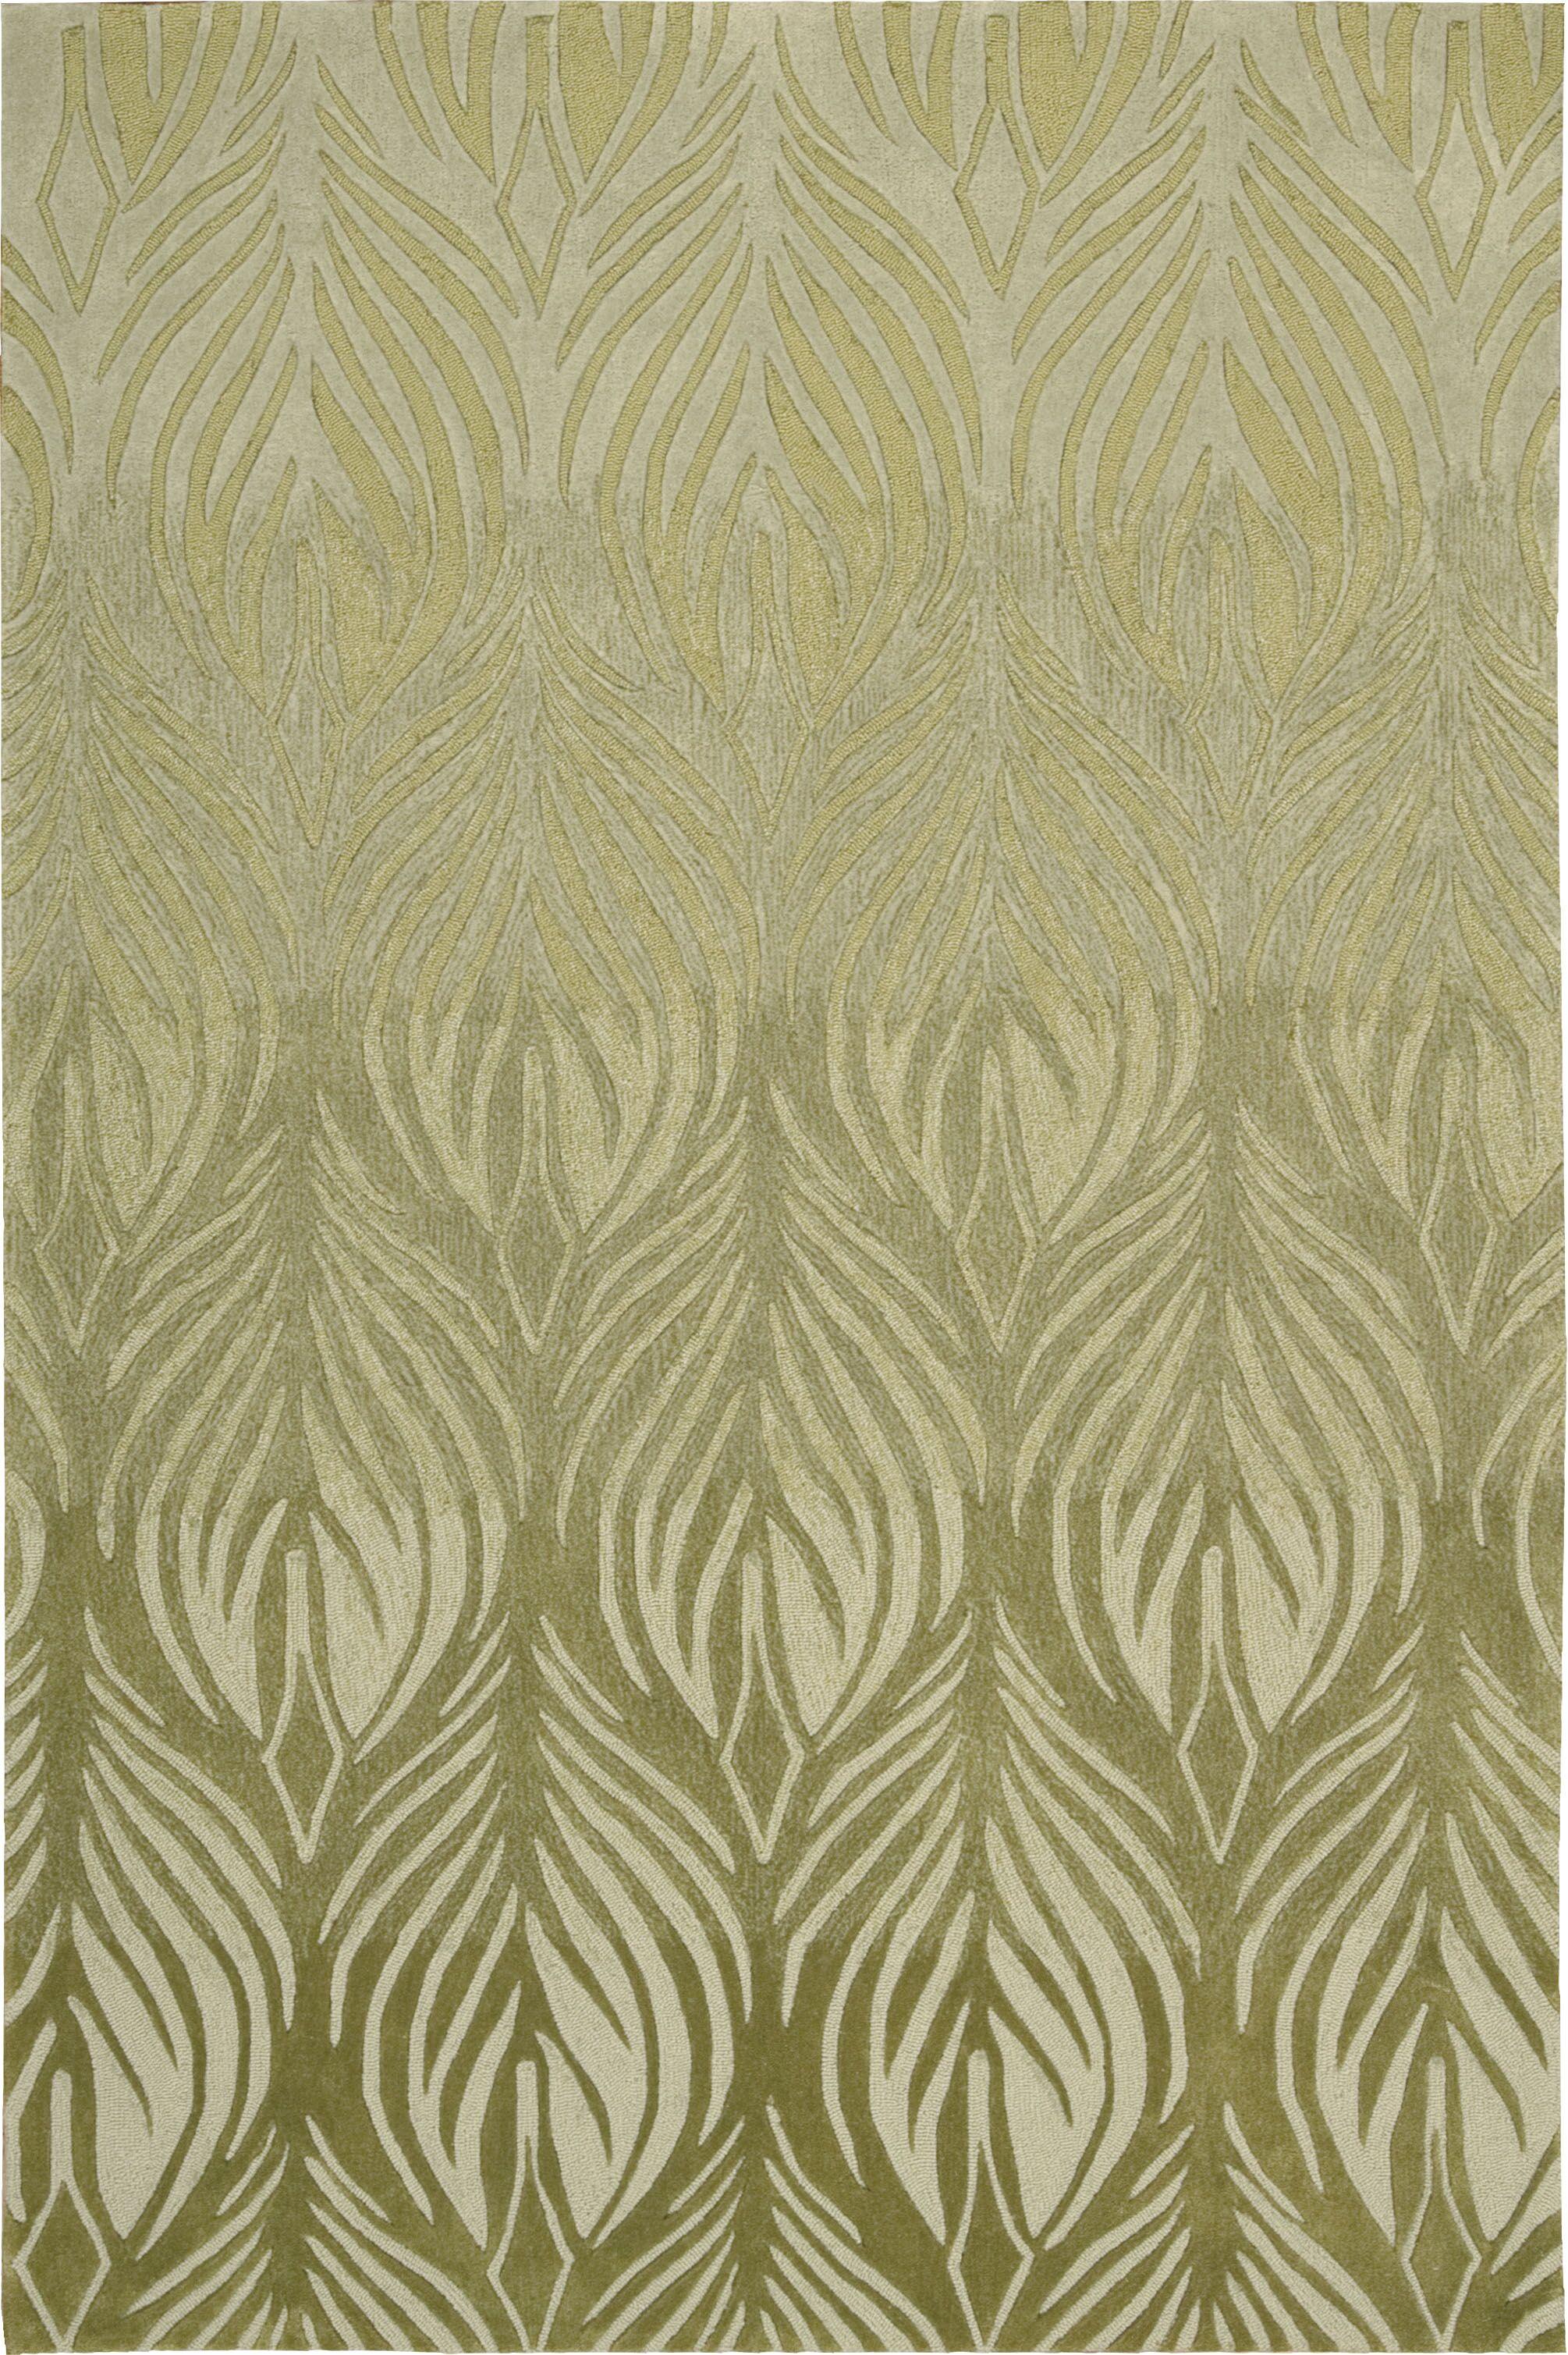 Rhames Hand-Tufted Green Area Rug Rug Size: Rectangle 5' x 7'6